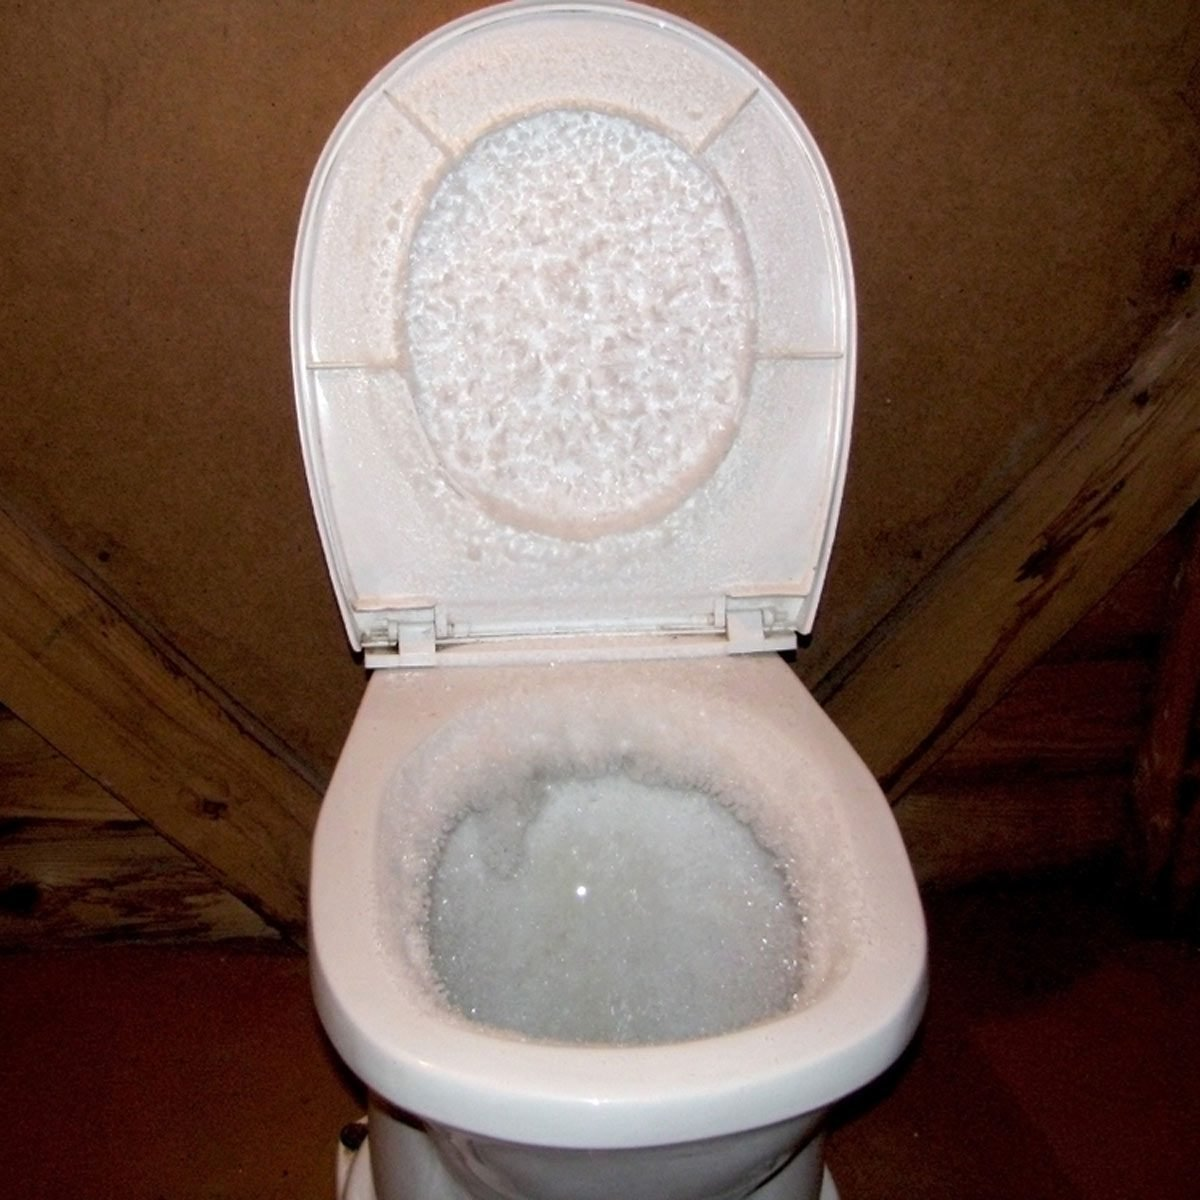 exploding toilet frozen